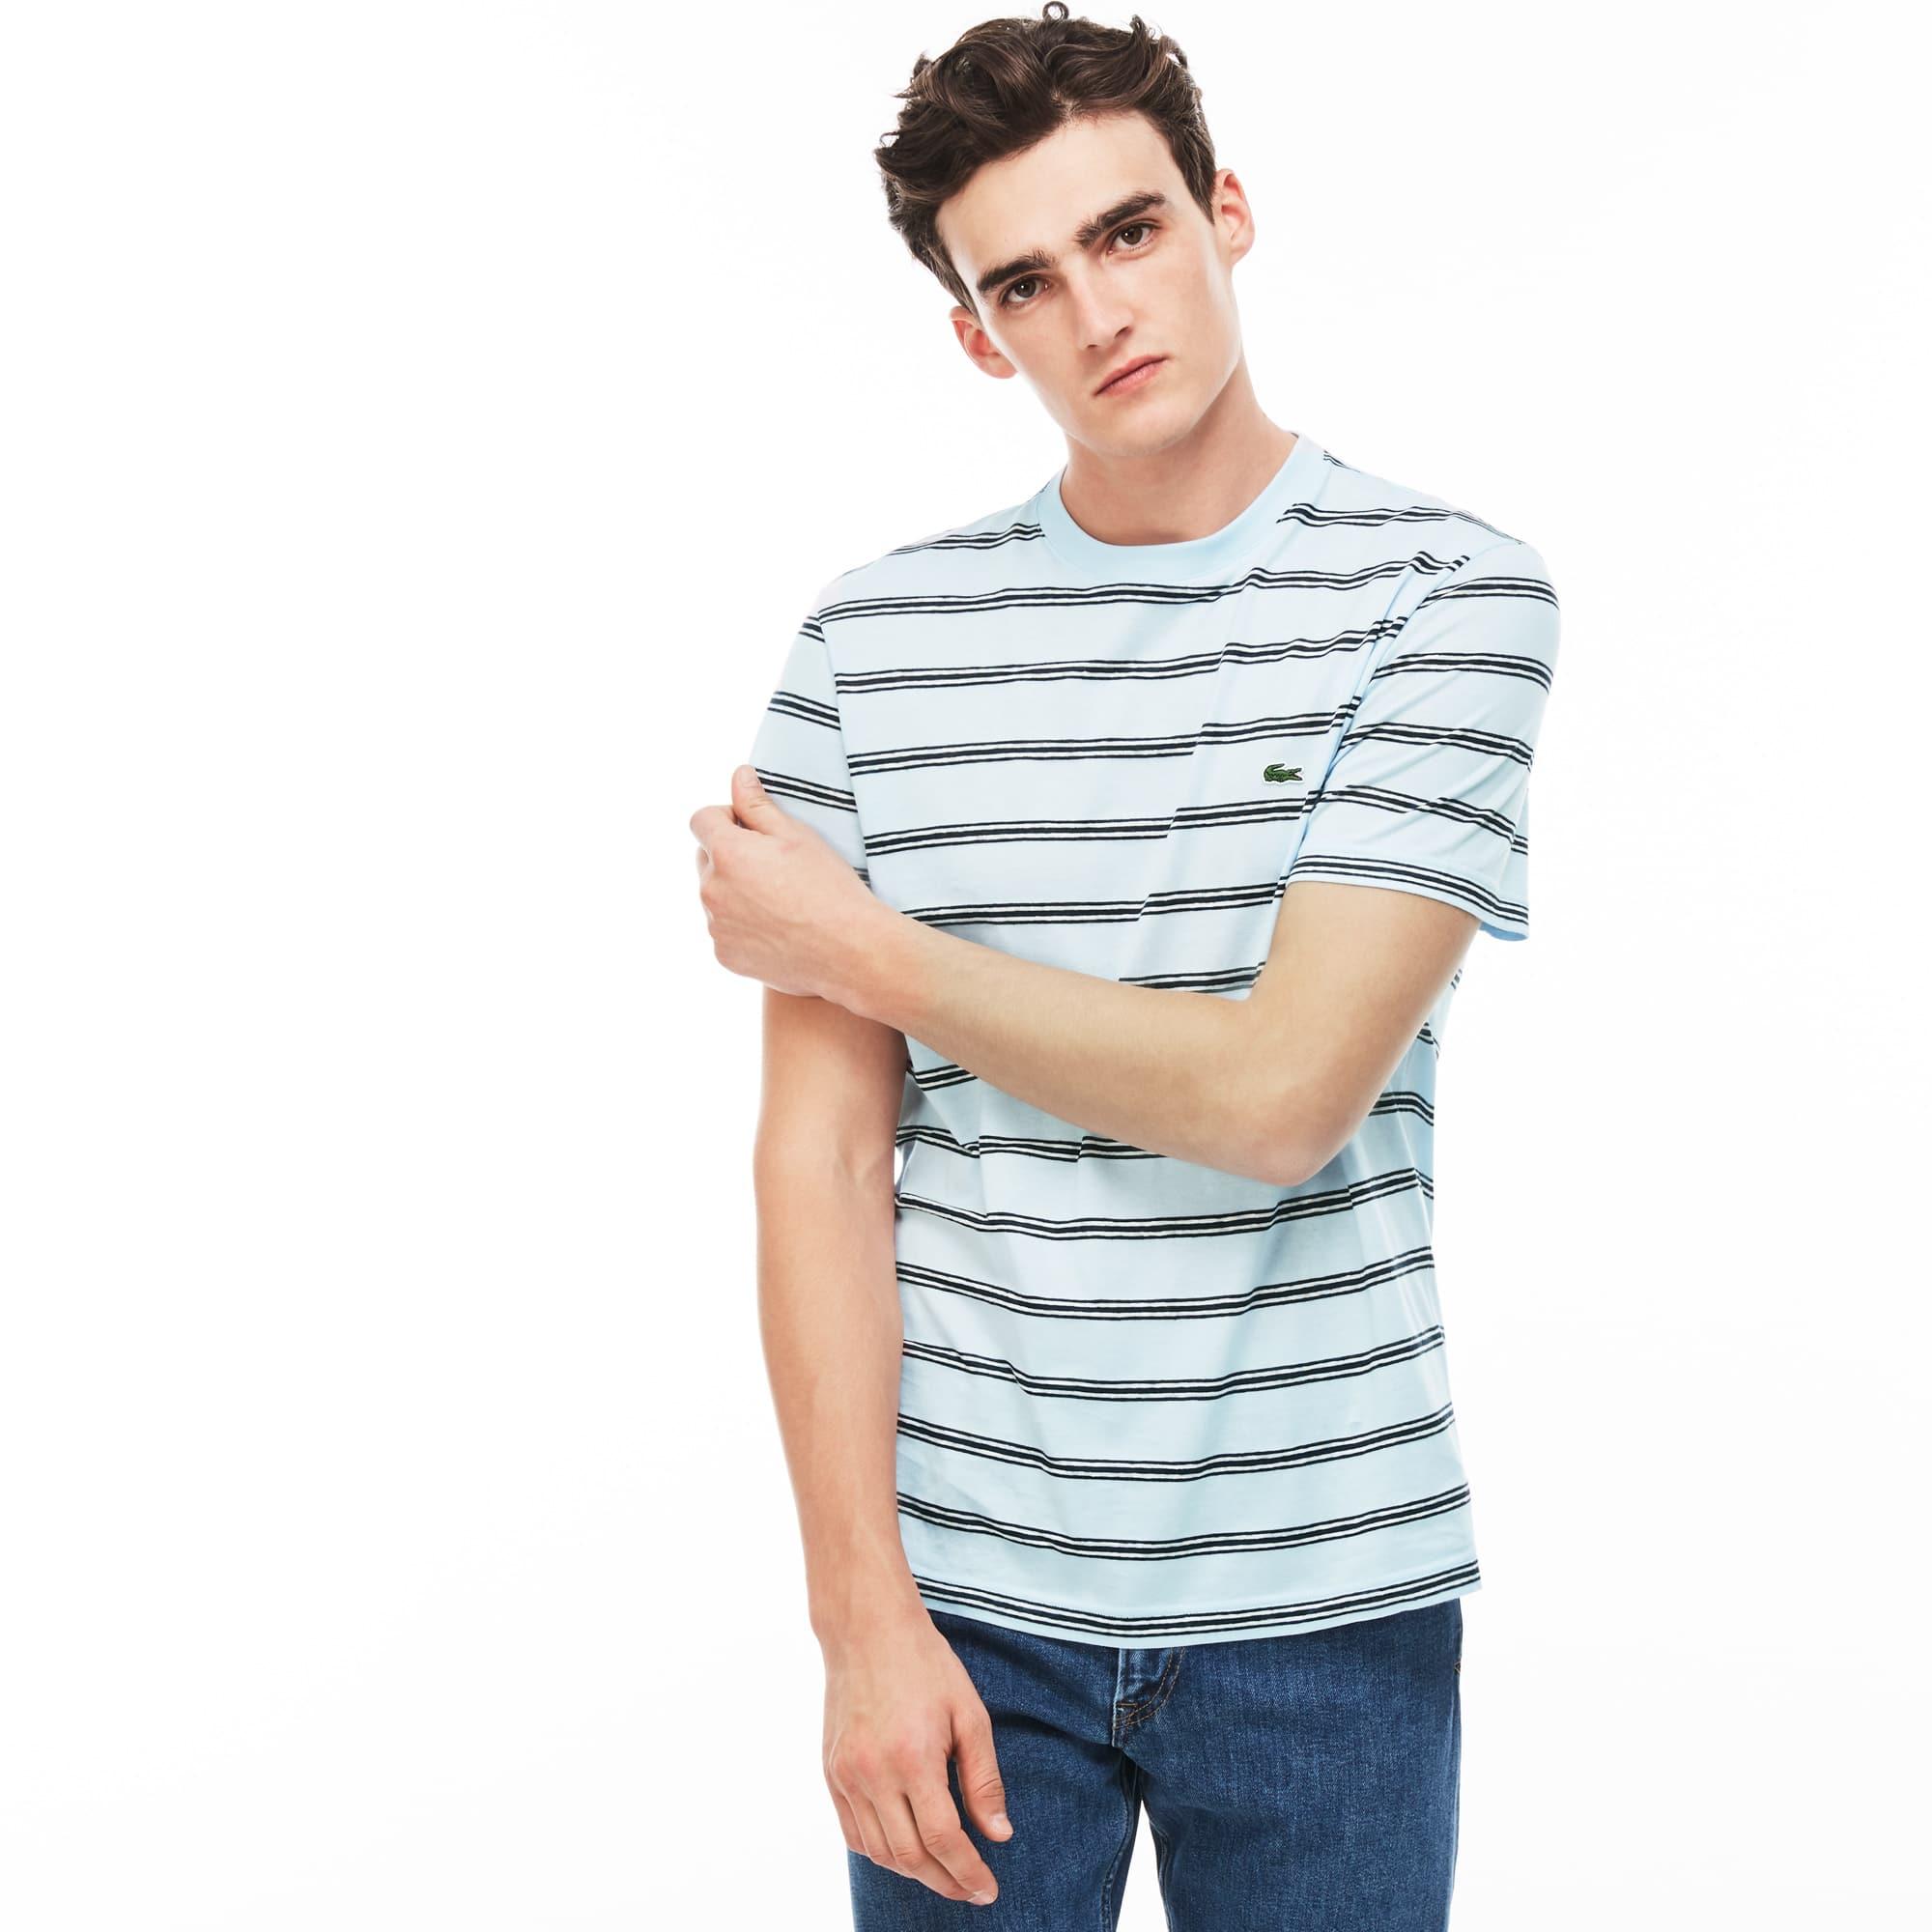 Camiseta De Rayas Con Cuello Redondo